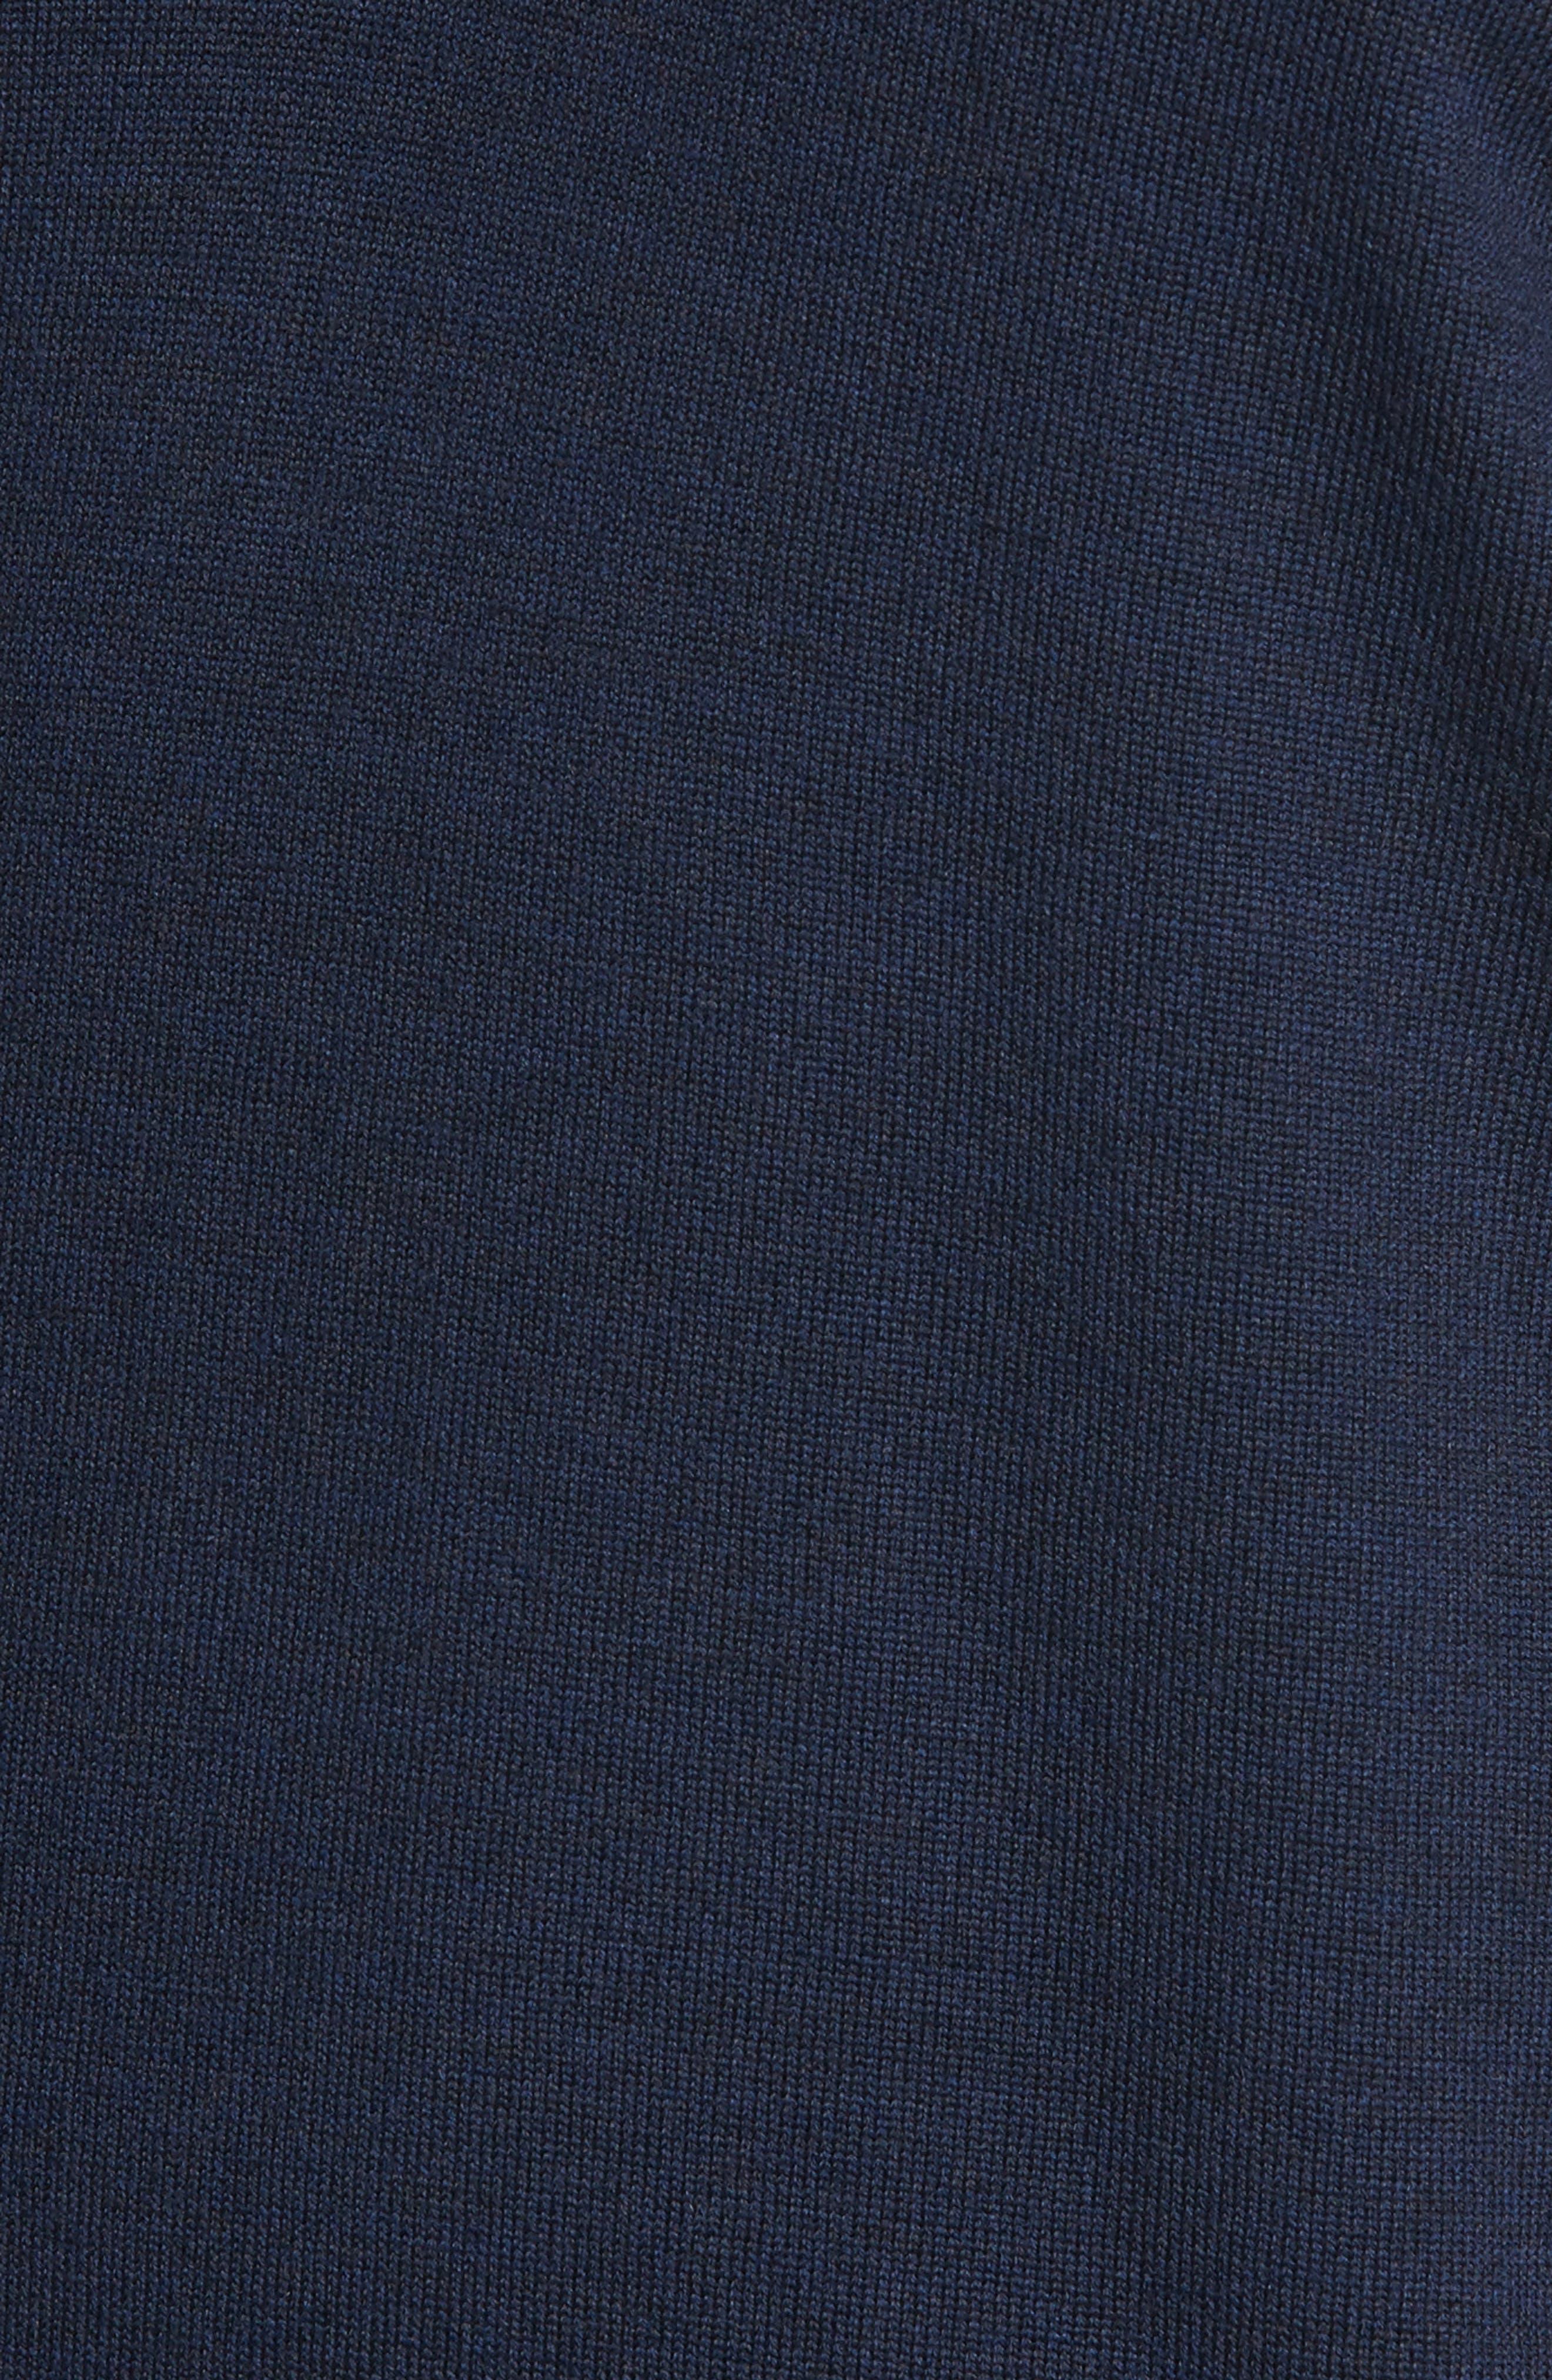 Merino Wool Blend Mock Neck Sweater,                             Alternate thumbnail 15, color,